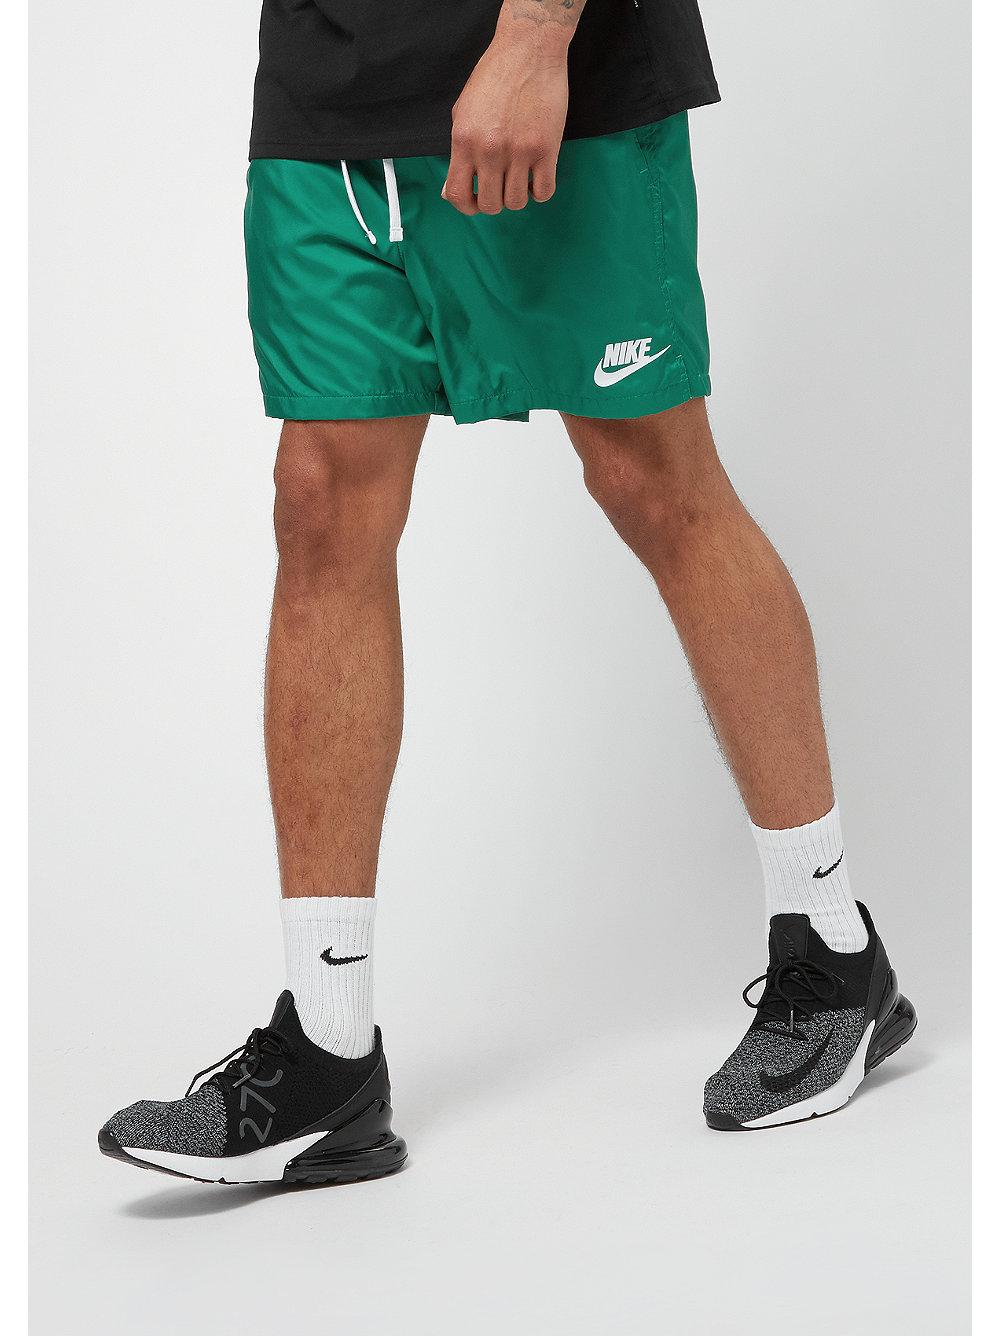 Nike Sportswear FLOW - Short - green noise/white DAa6Aq